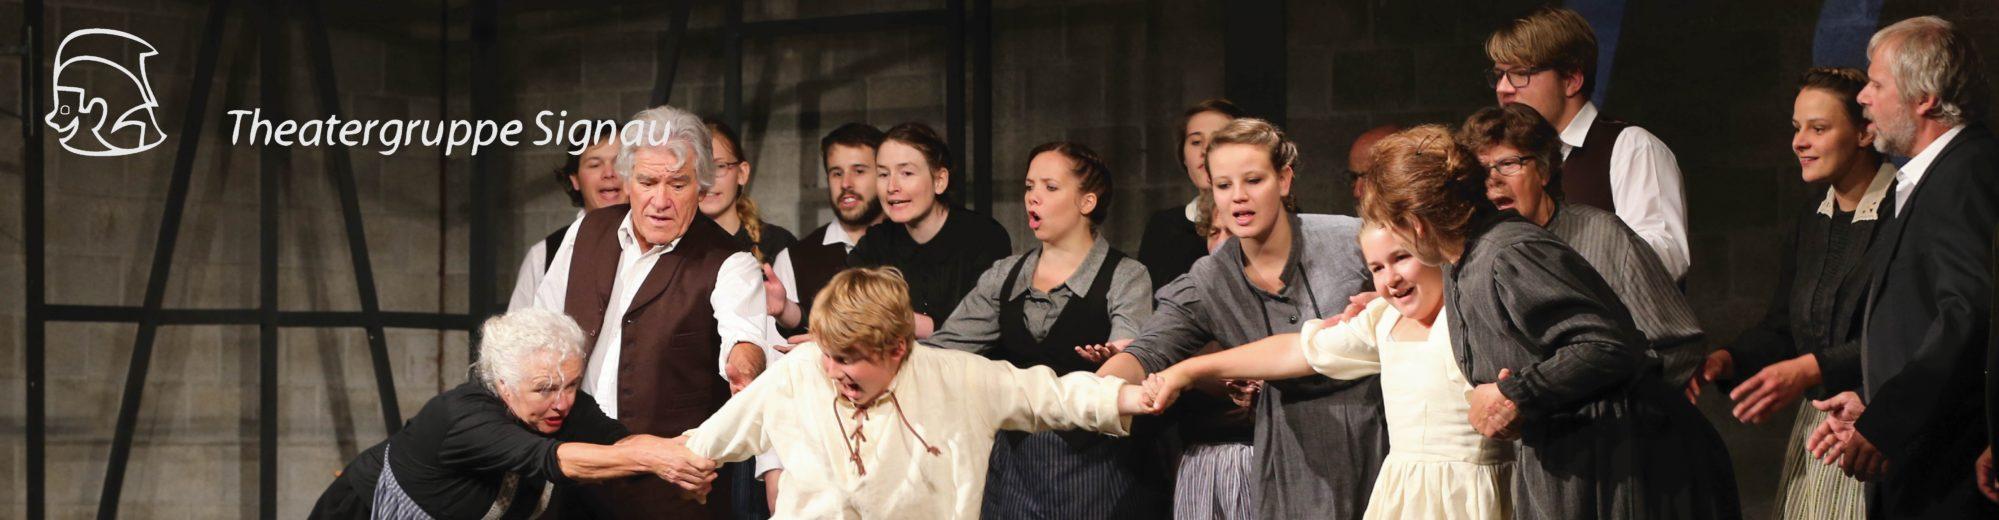 Theatergruppe Signau